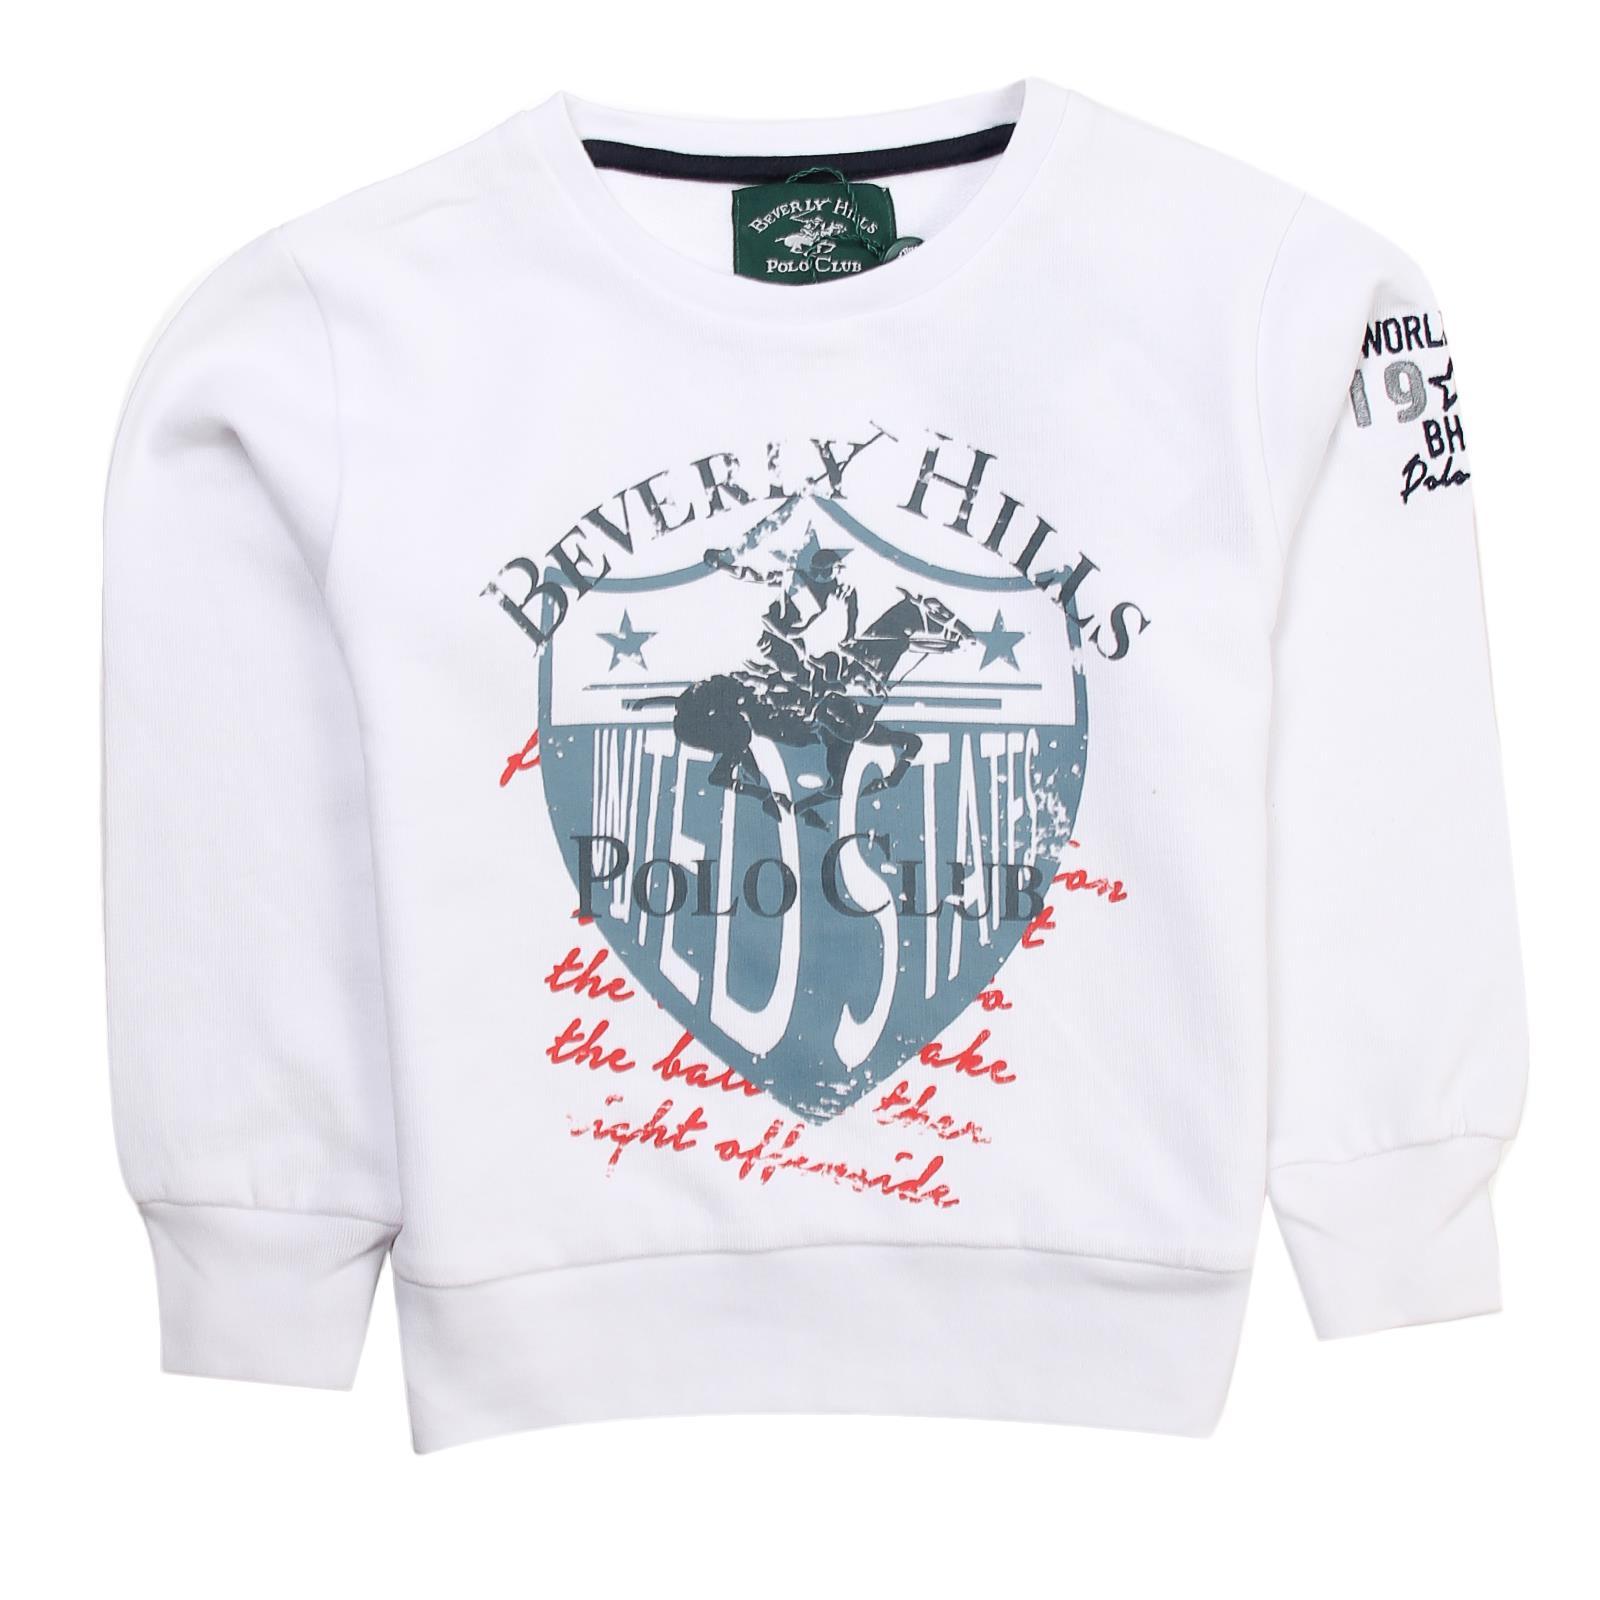 beverly hills polo club nr 1